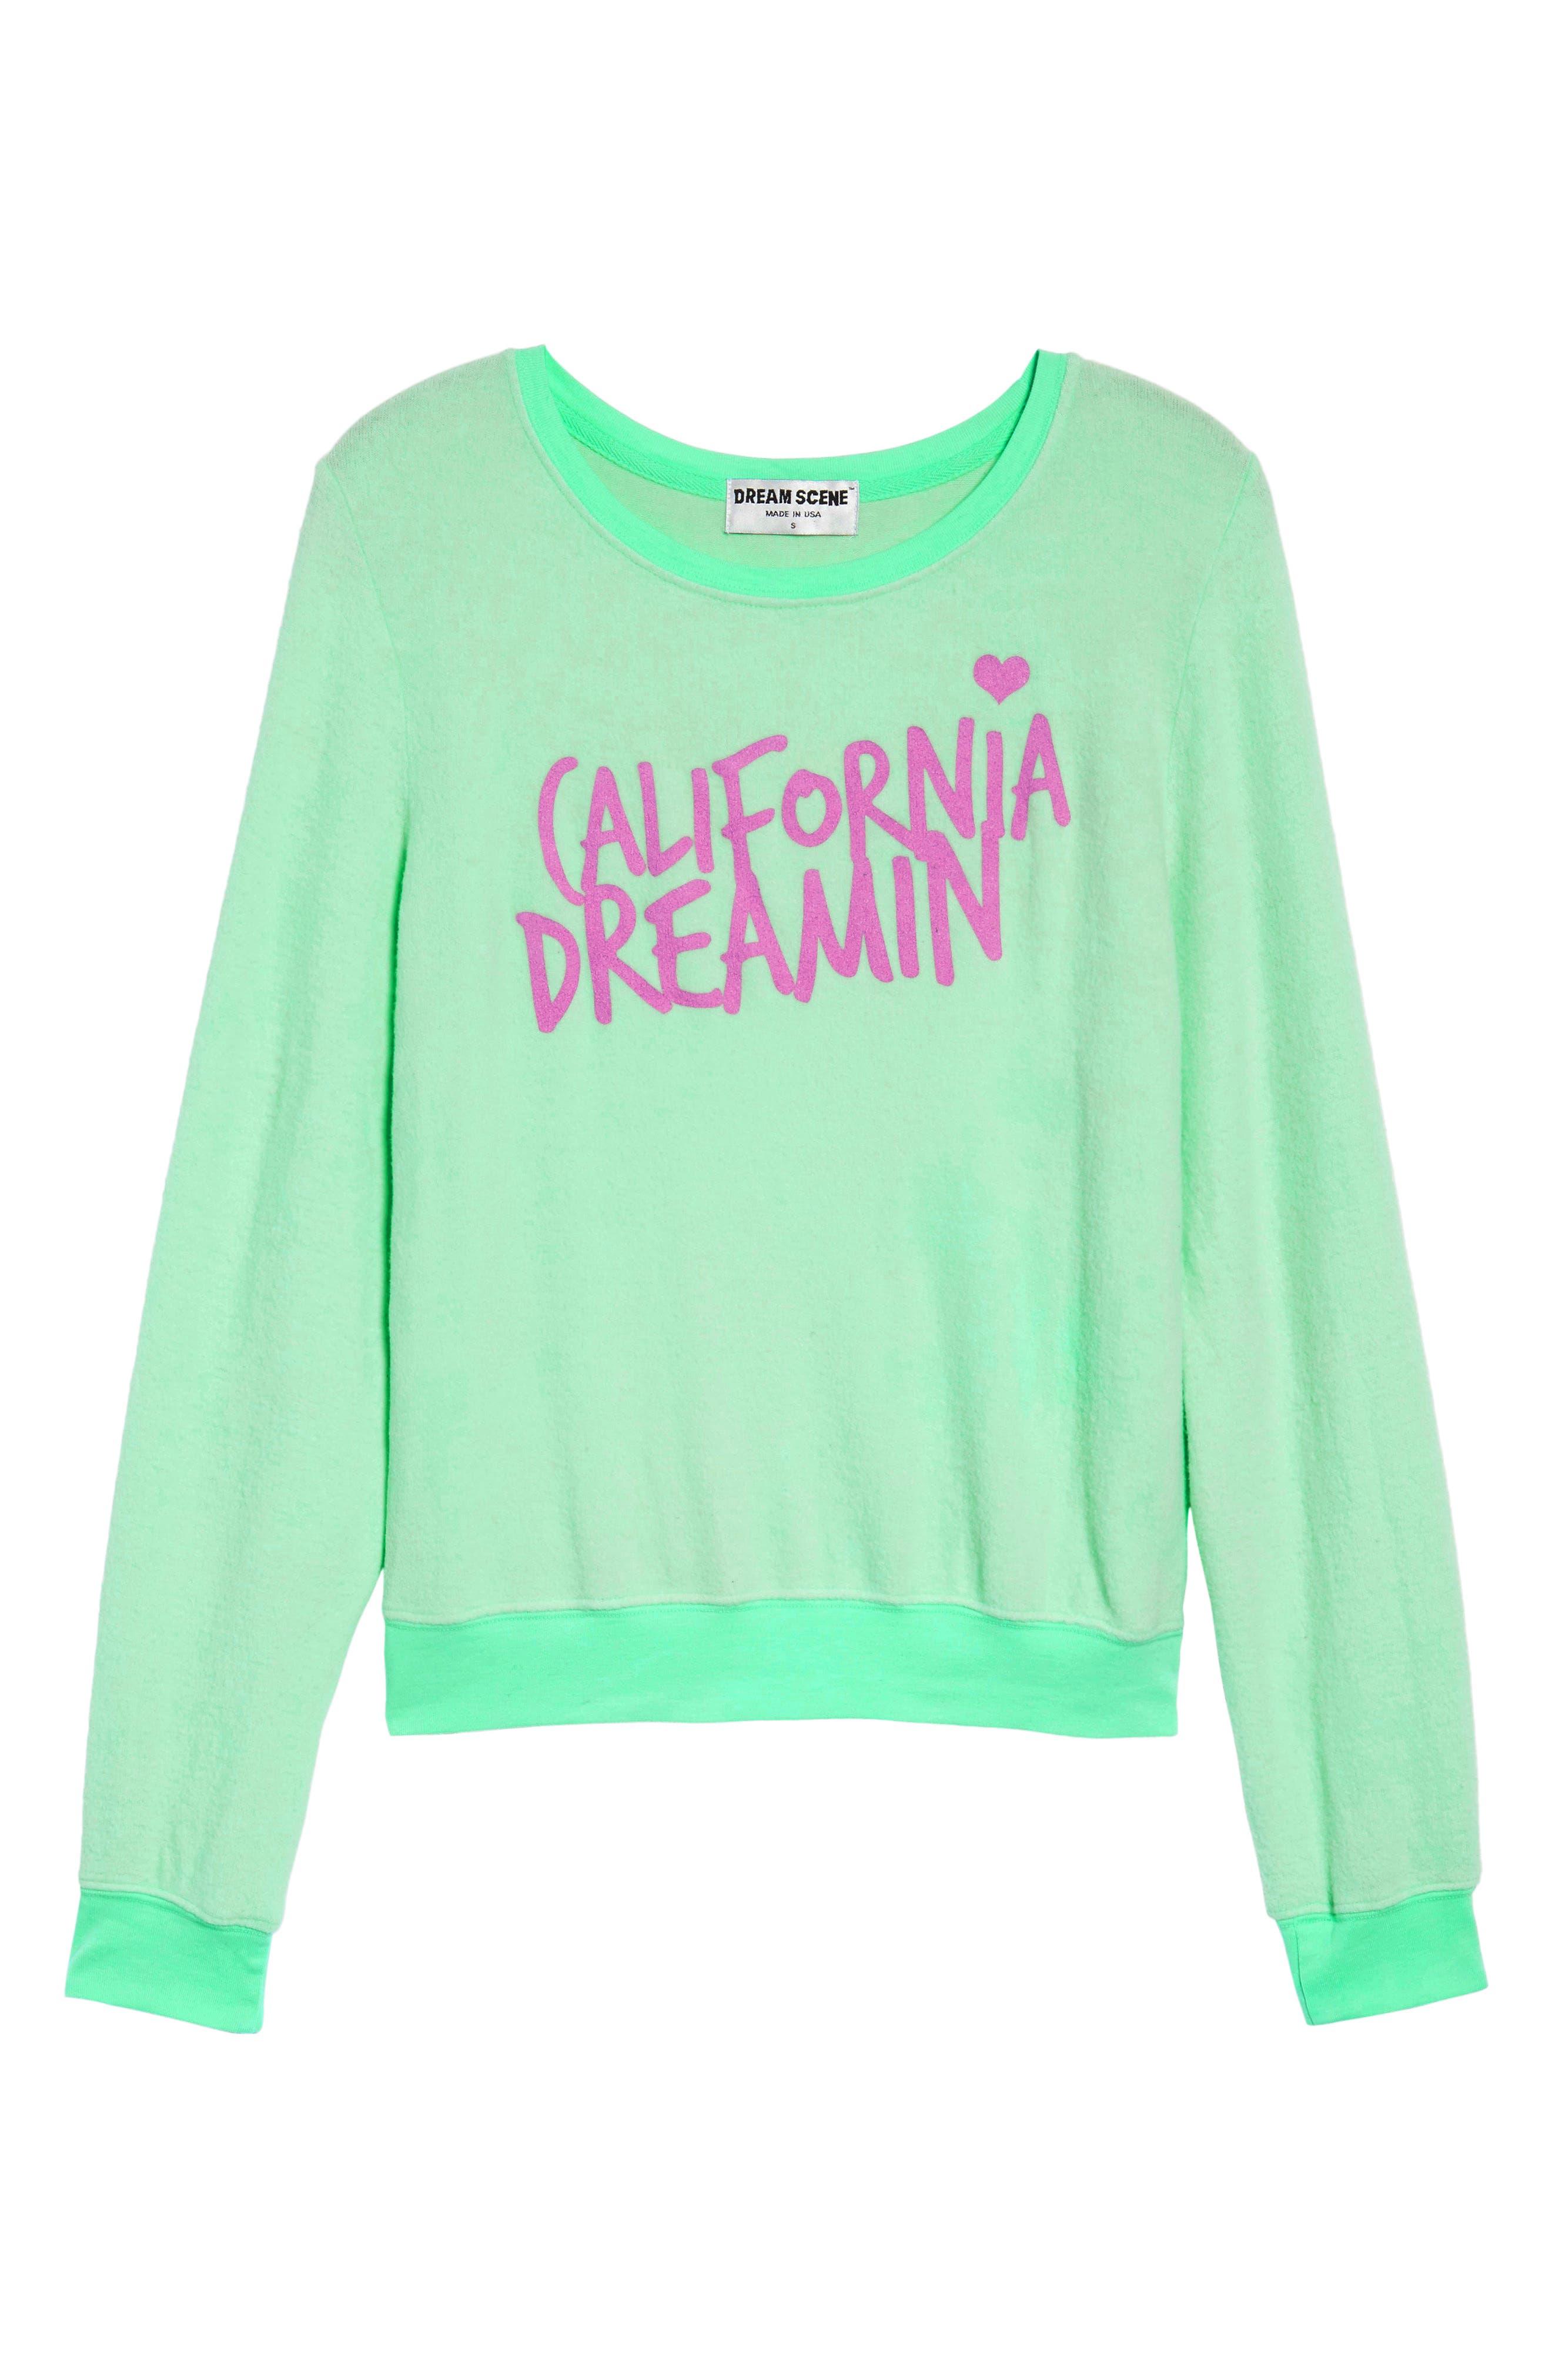 California Dreamin Sweatshirt,                             Alternate thumbnail 6, color,                             320